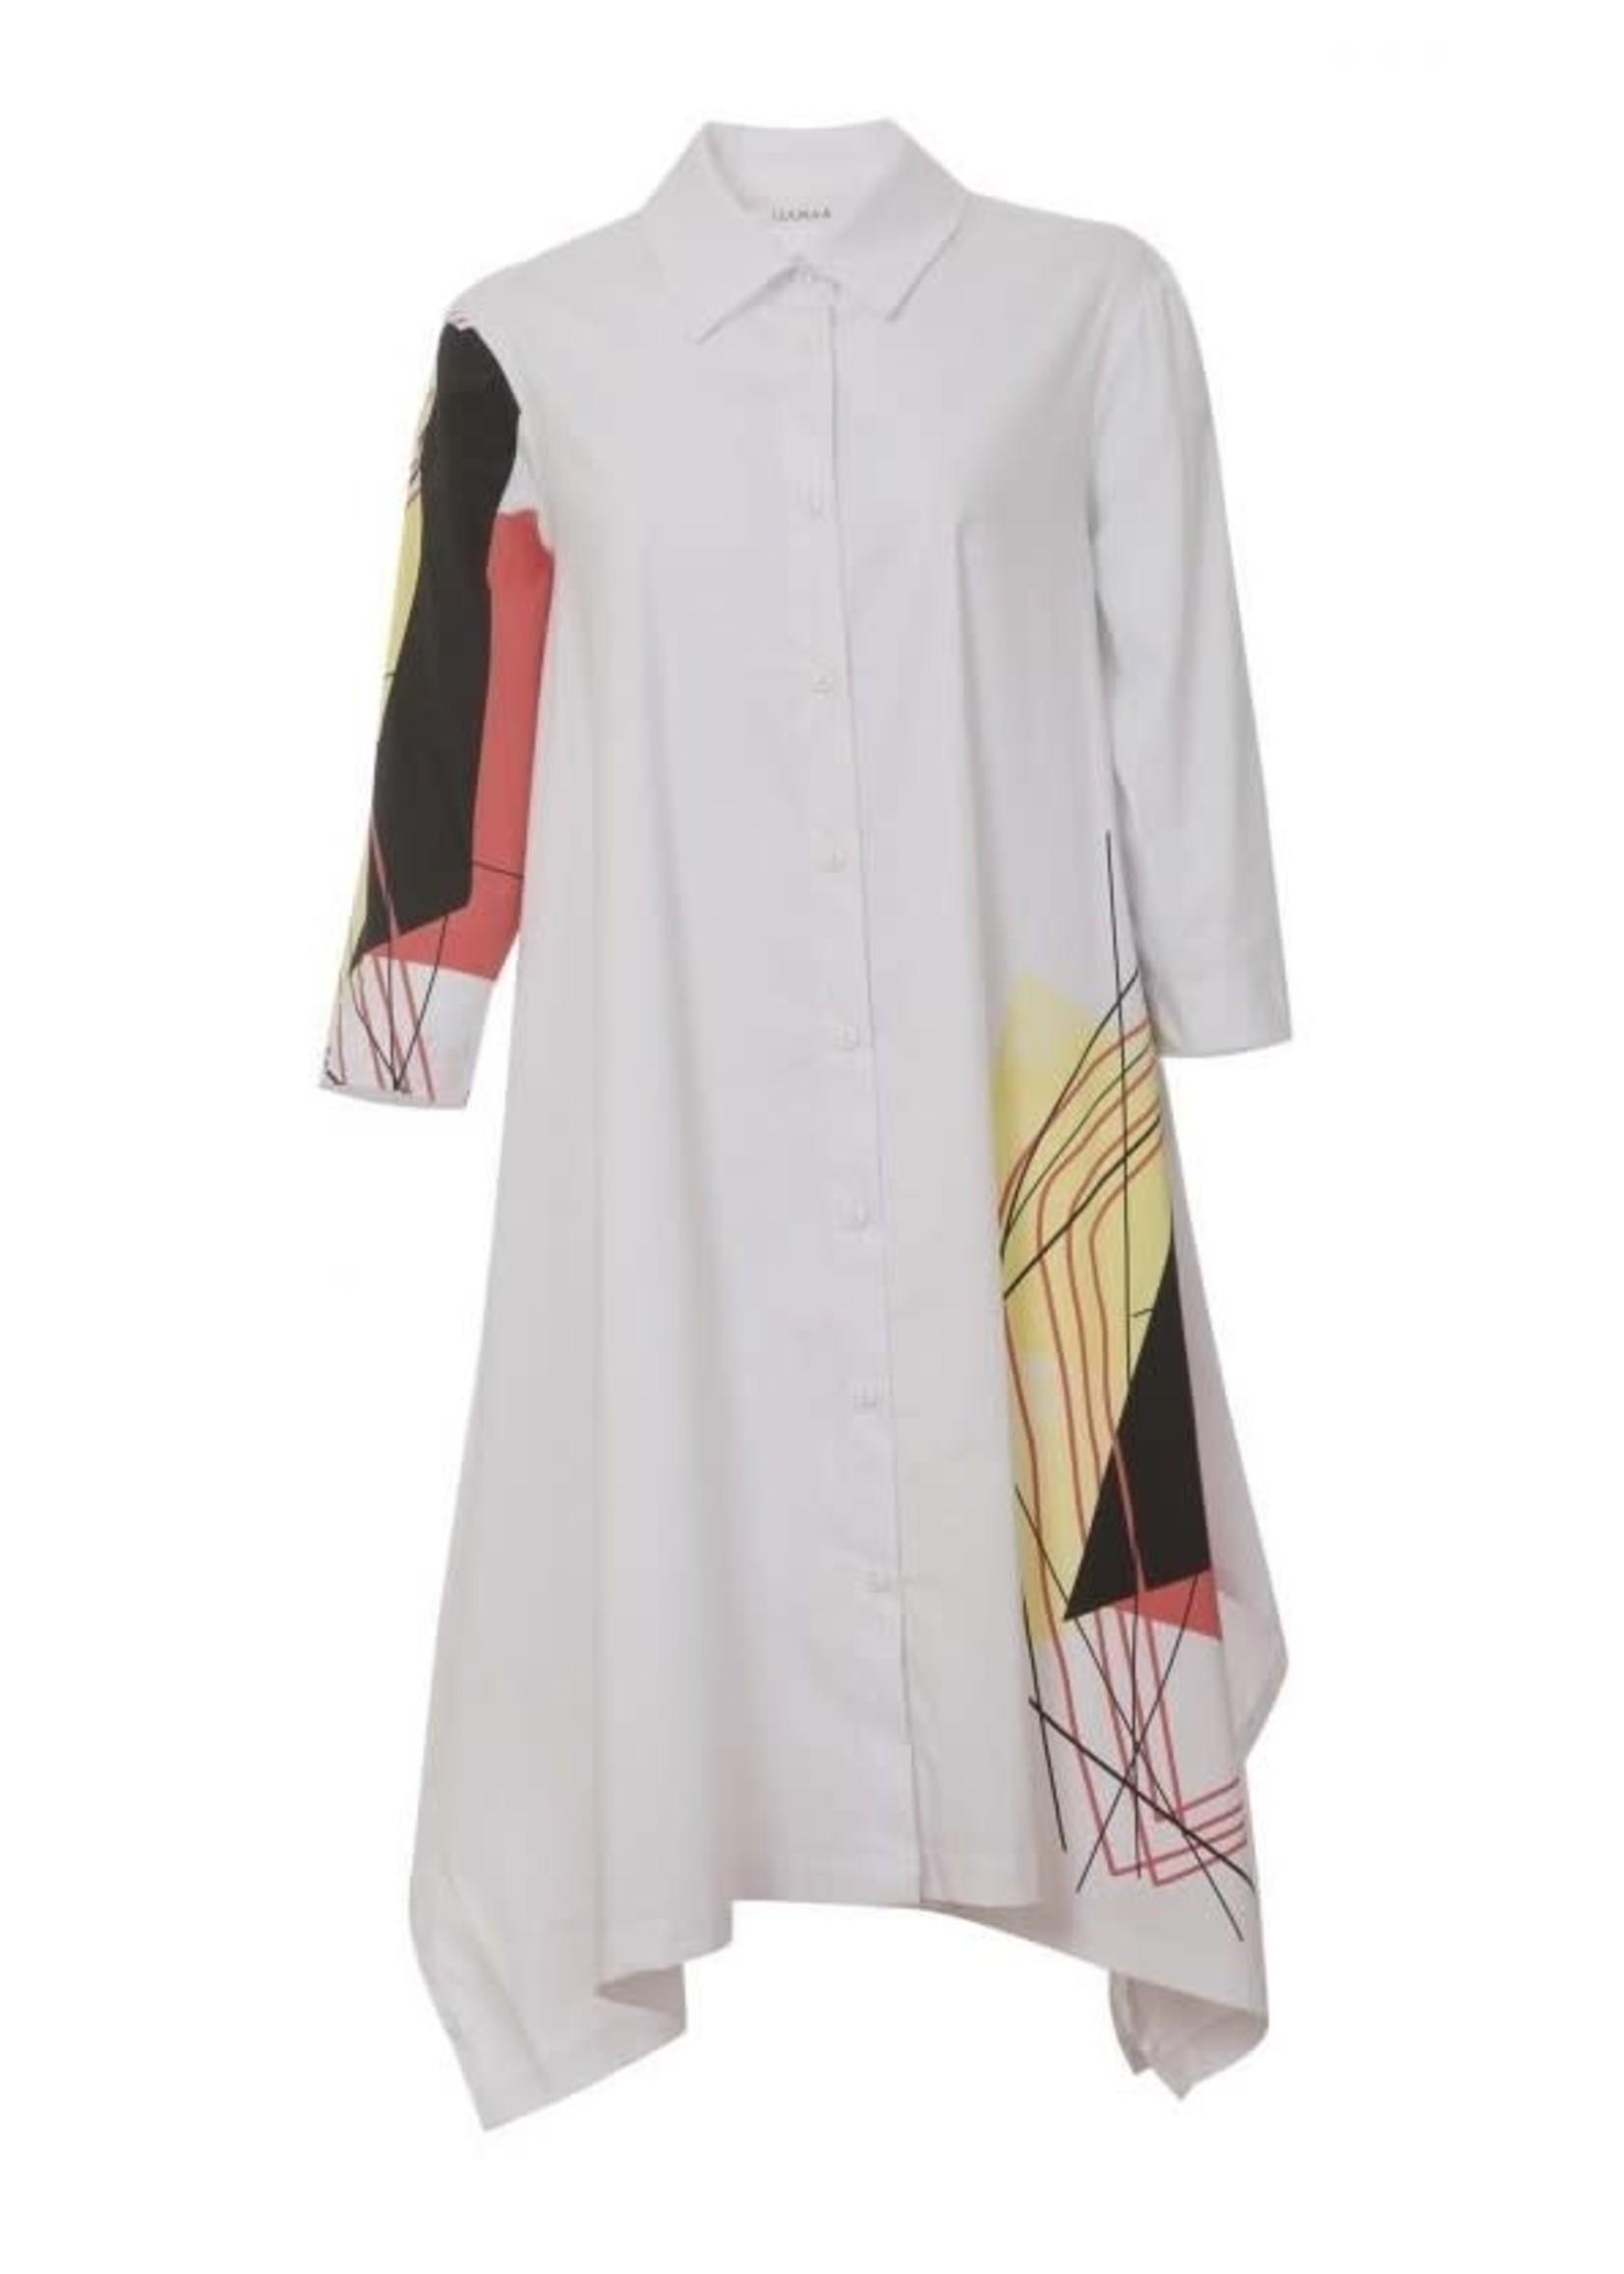 LUUKAA 20y104 long poplin cotton shirt